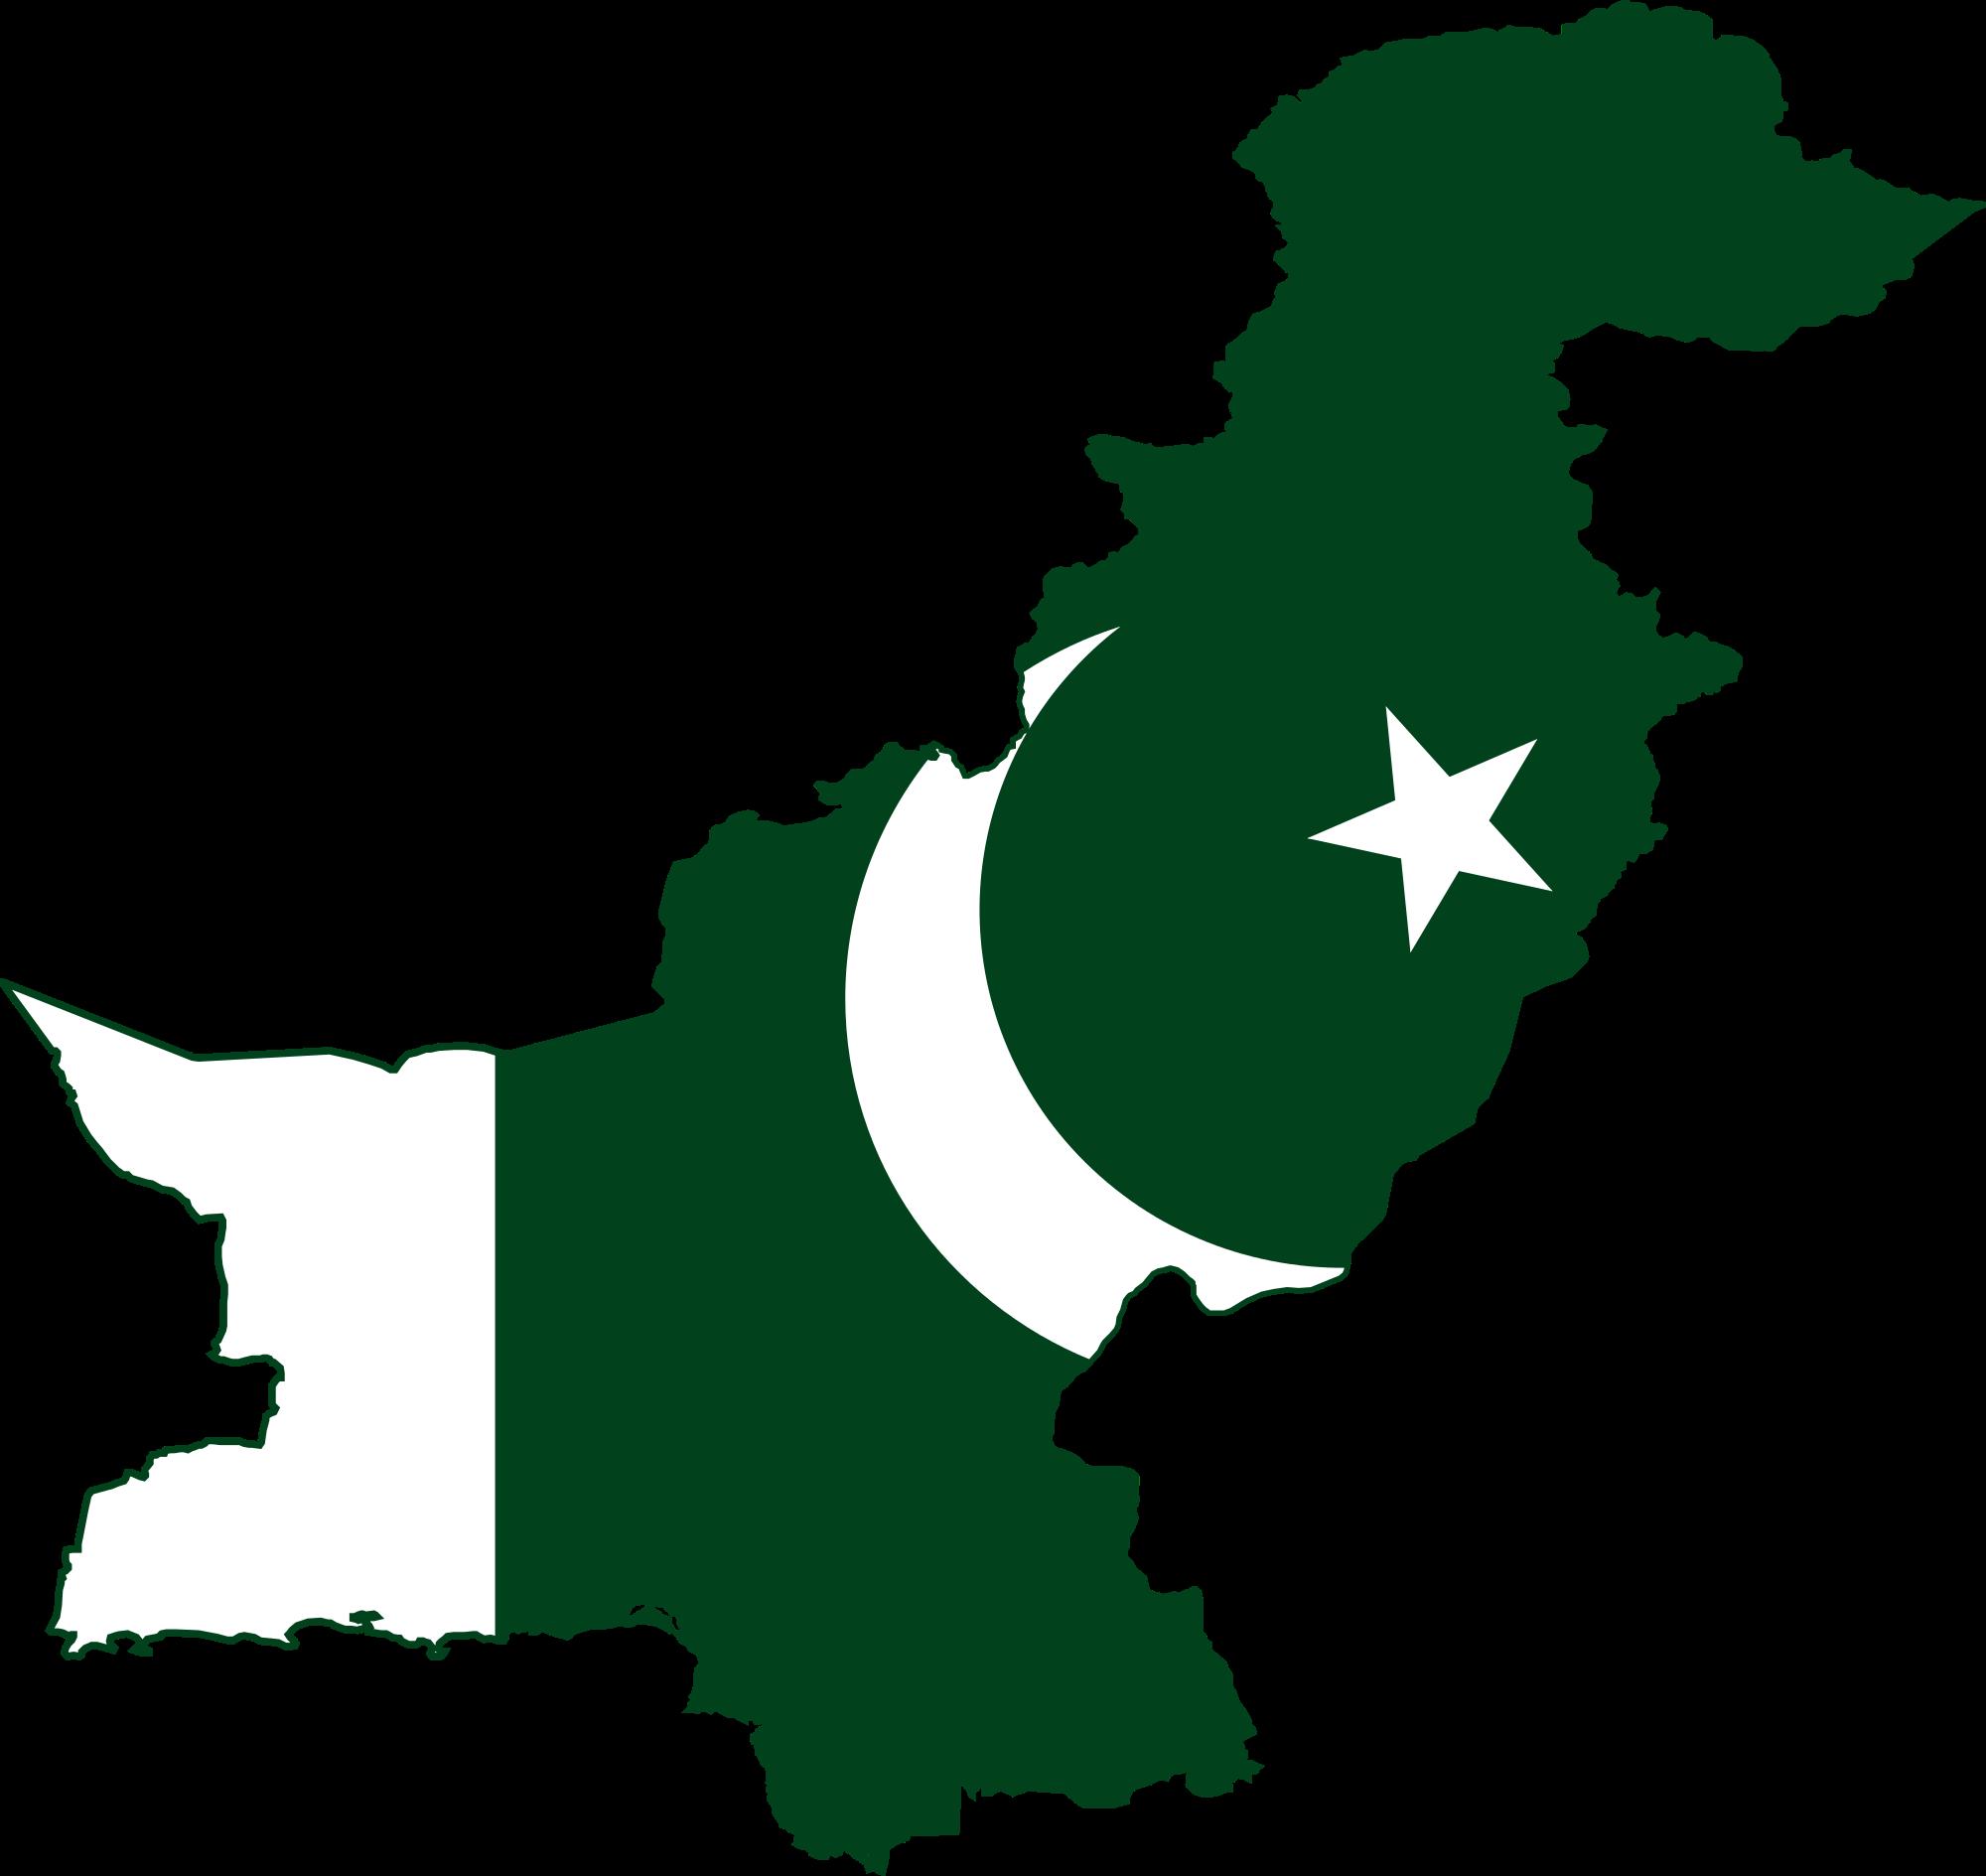 Pakistan svg #18, Download drawings